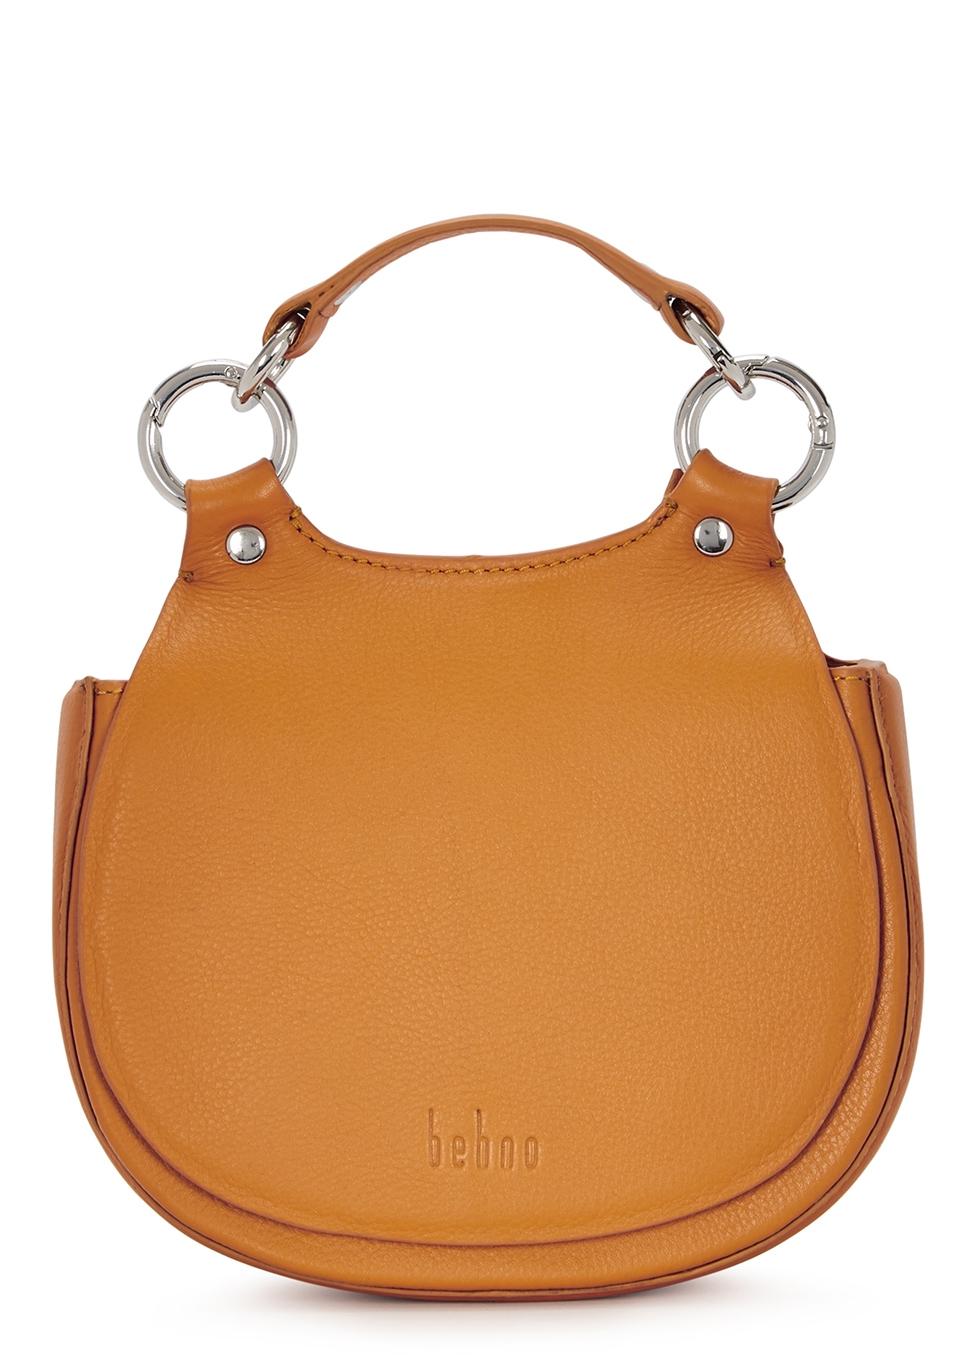 Tilda mini orange leather saddle bag - Behno